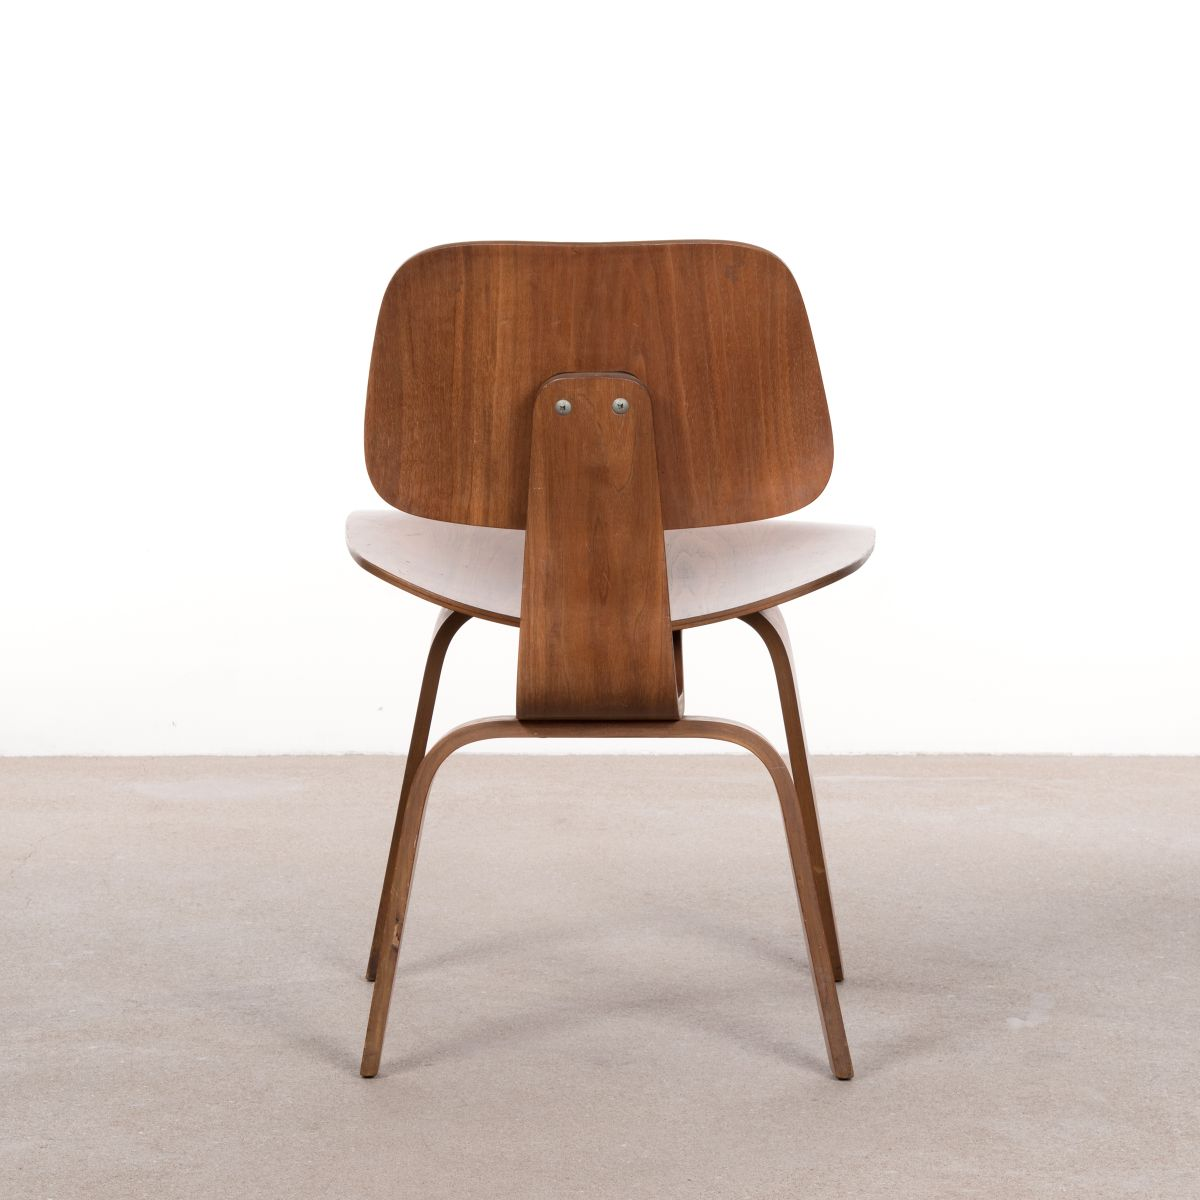 dcw walnuss schichtholz stuhl von charles ray eames f r. Black Bedroom Furniture Sets. Home Design Ideas